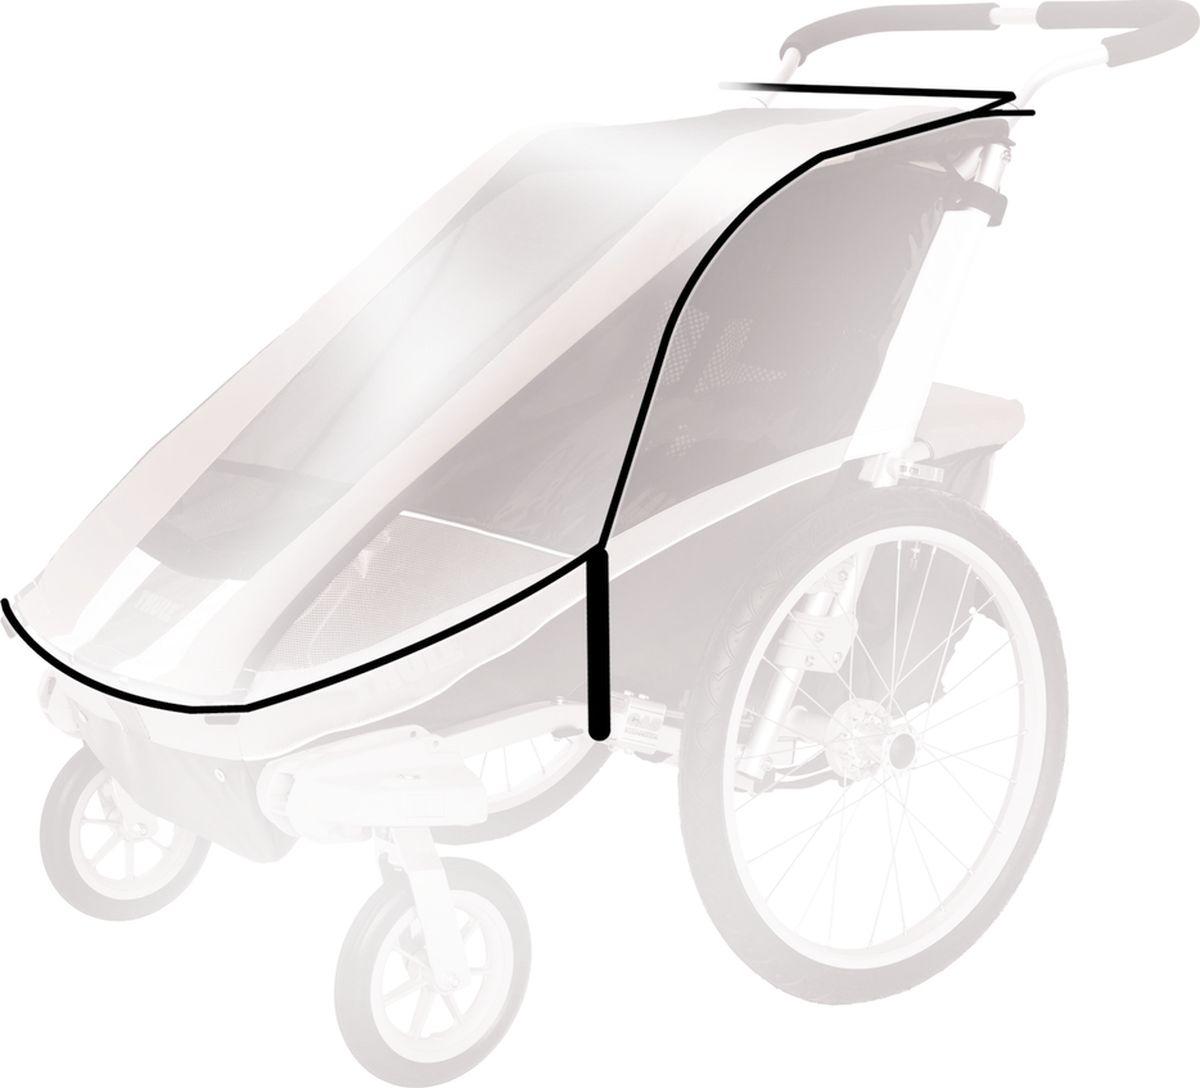 Thule Дождевой чехол для Chariot Corsaire 1 установочный комплект для багажника thule 1408